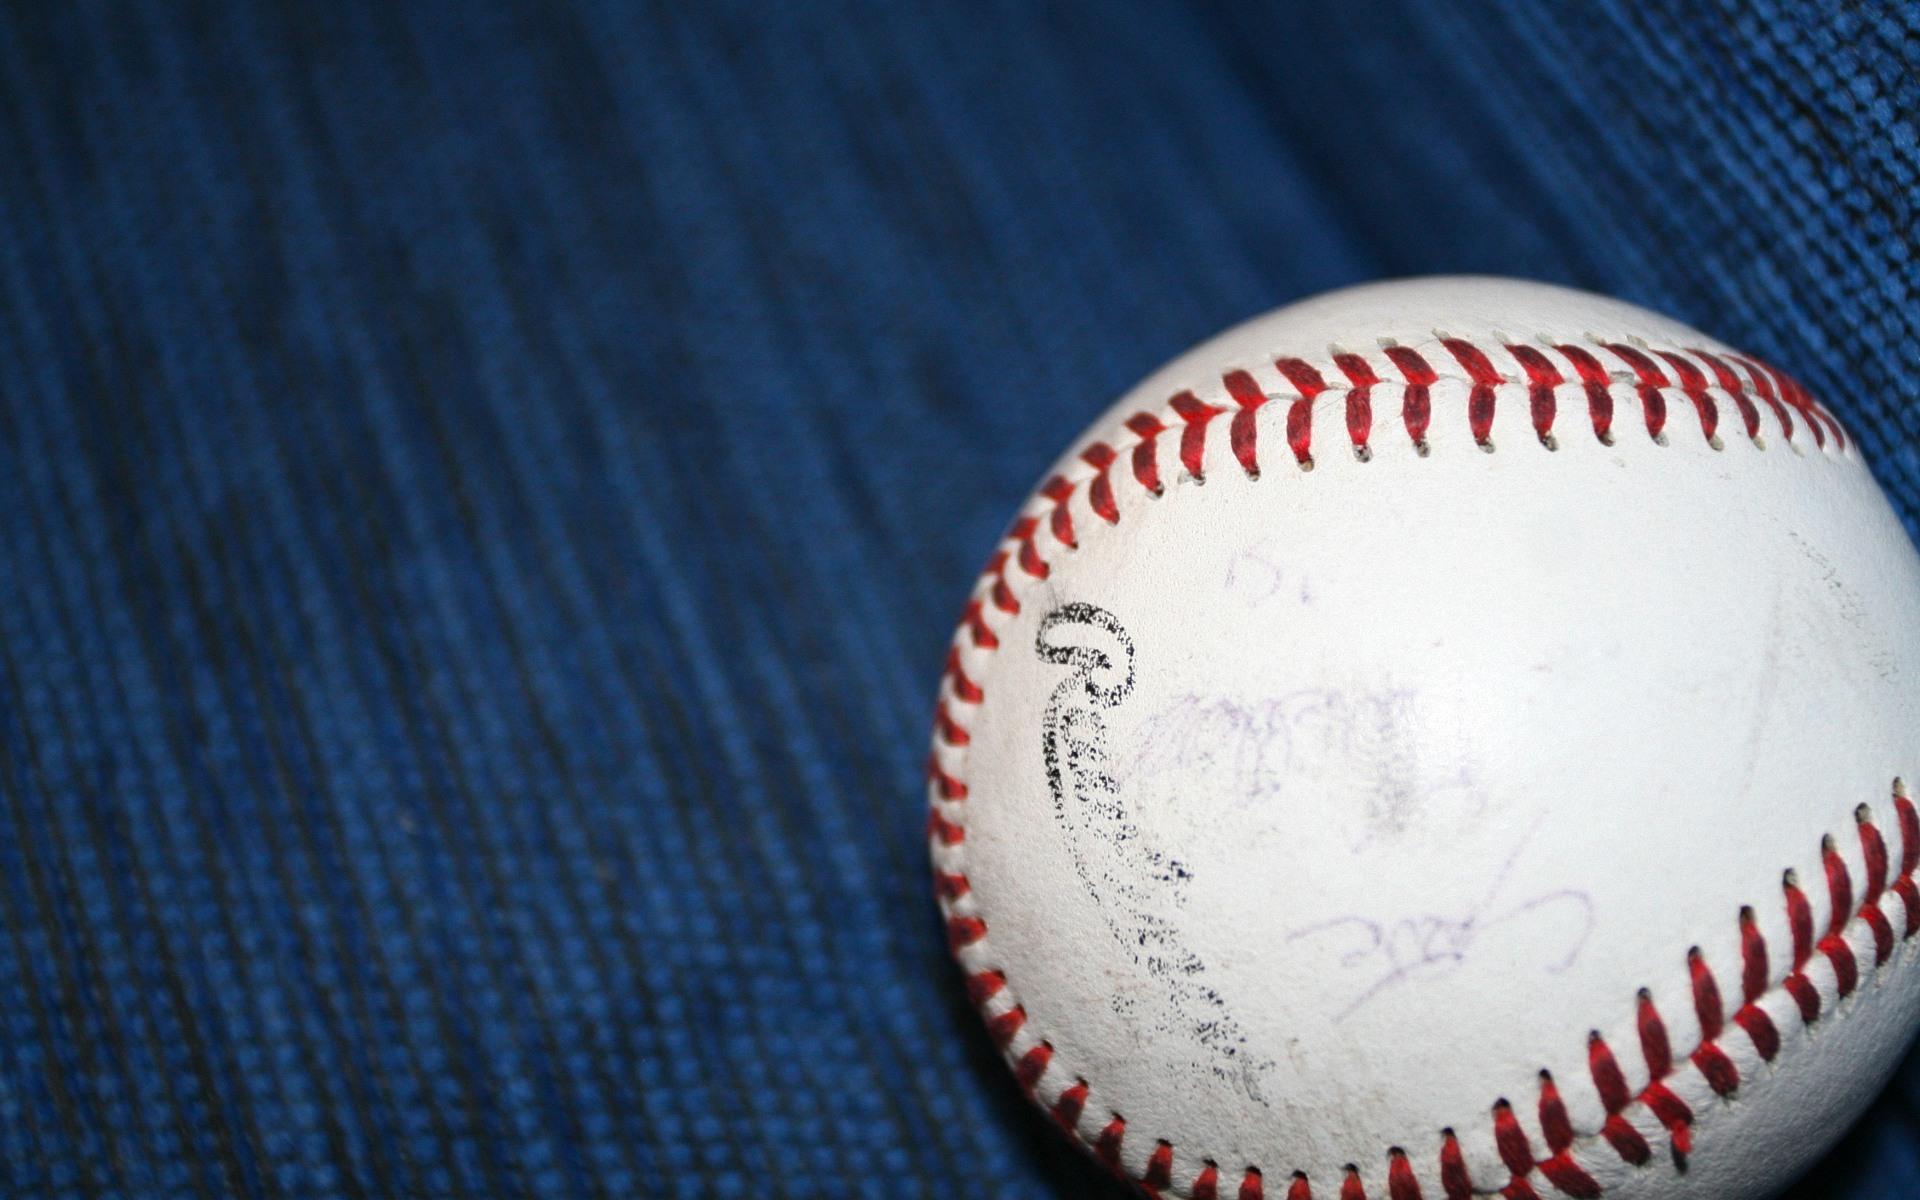 Rawlings Baseball 1920x1200 Wallpapers 1920x1200 Wallpapers 1920x1200